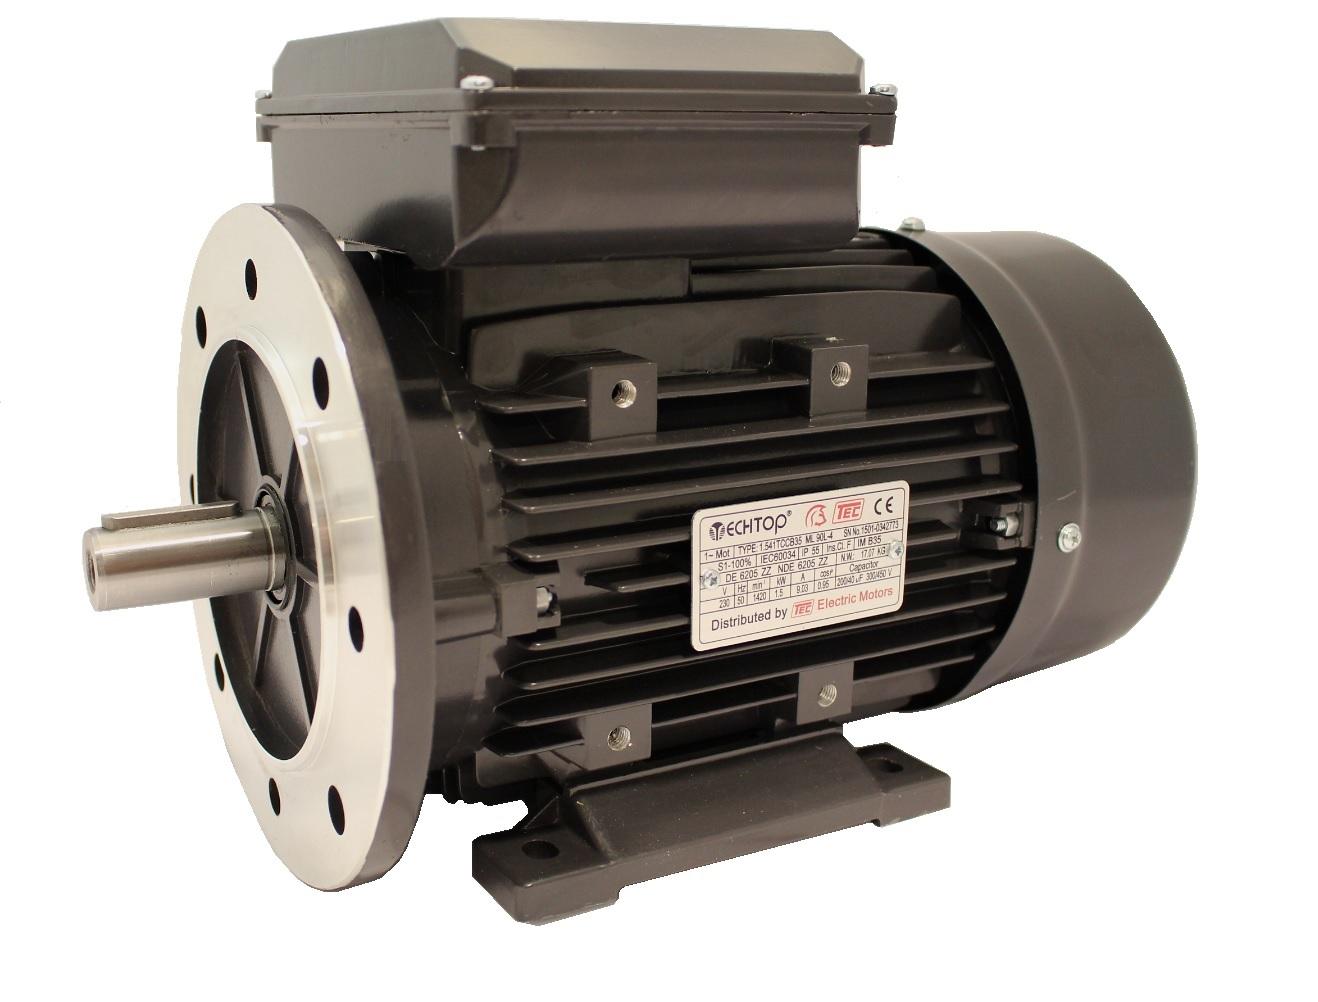 Quot Tec Single Phase 230v Electric Motor 1 1kw 4 Pole